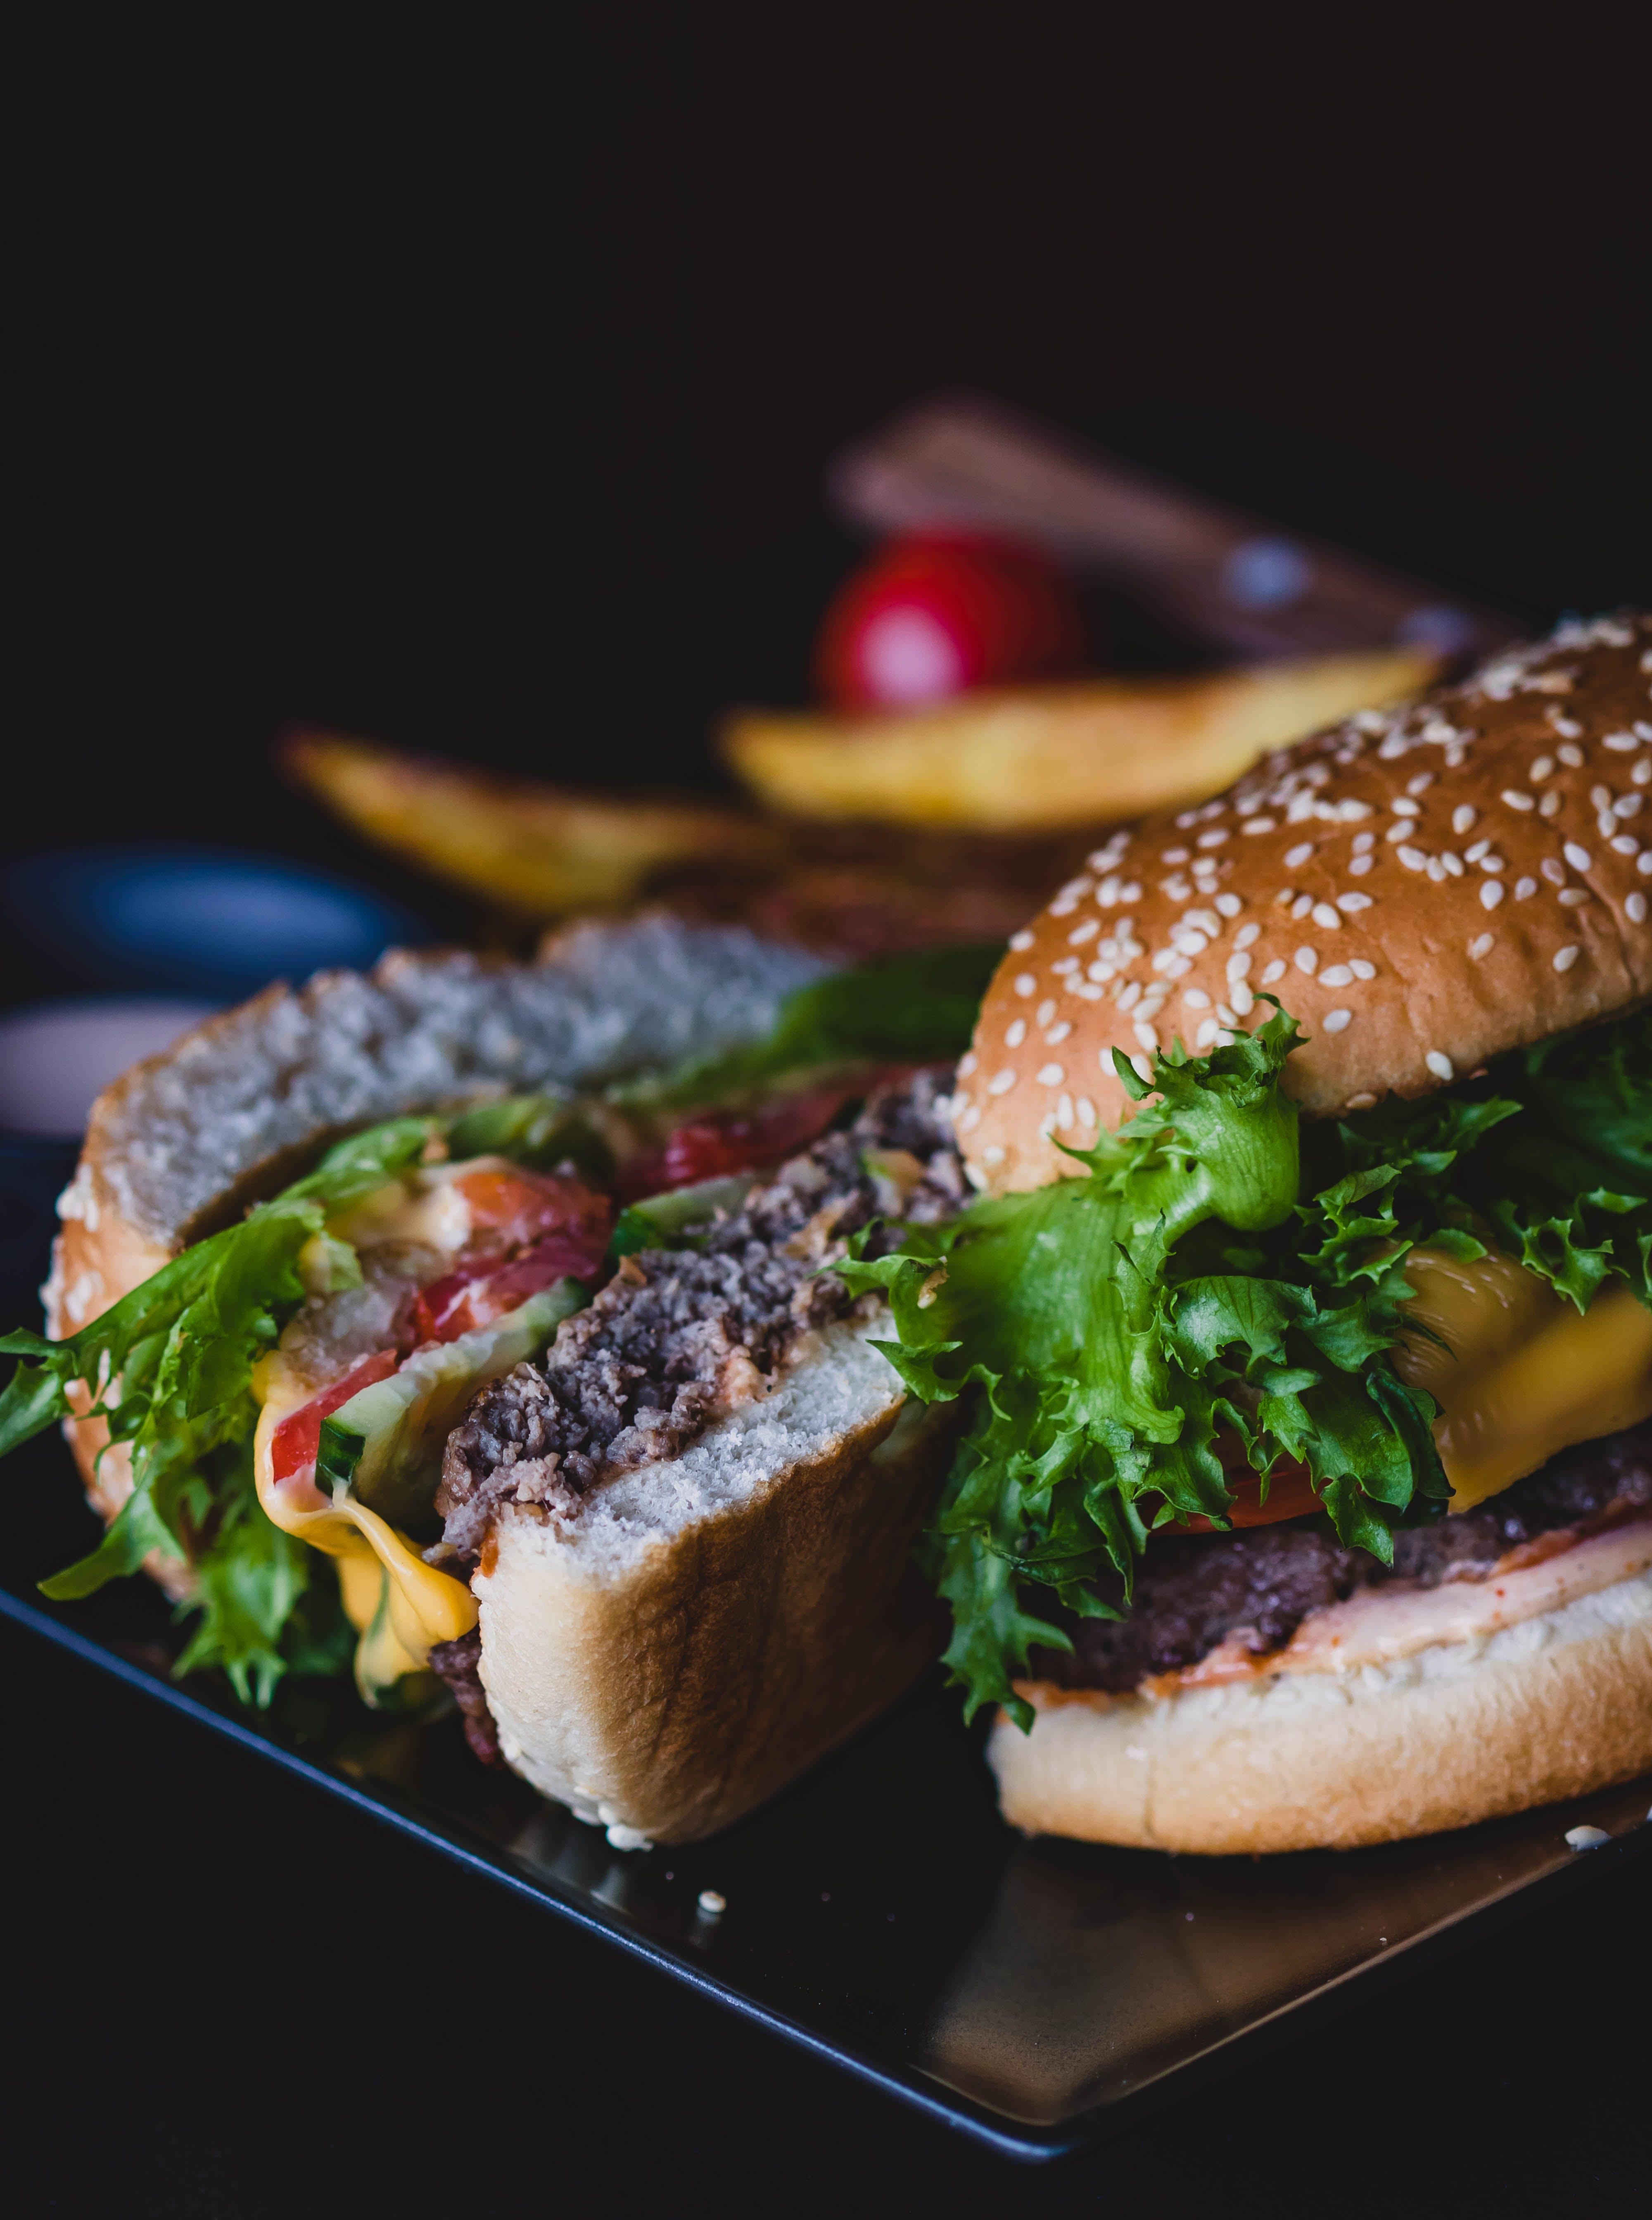 Sliced Cheeseburger